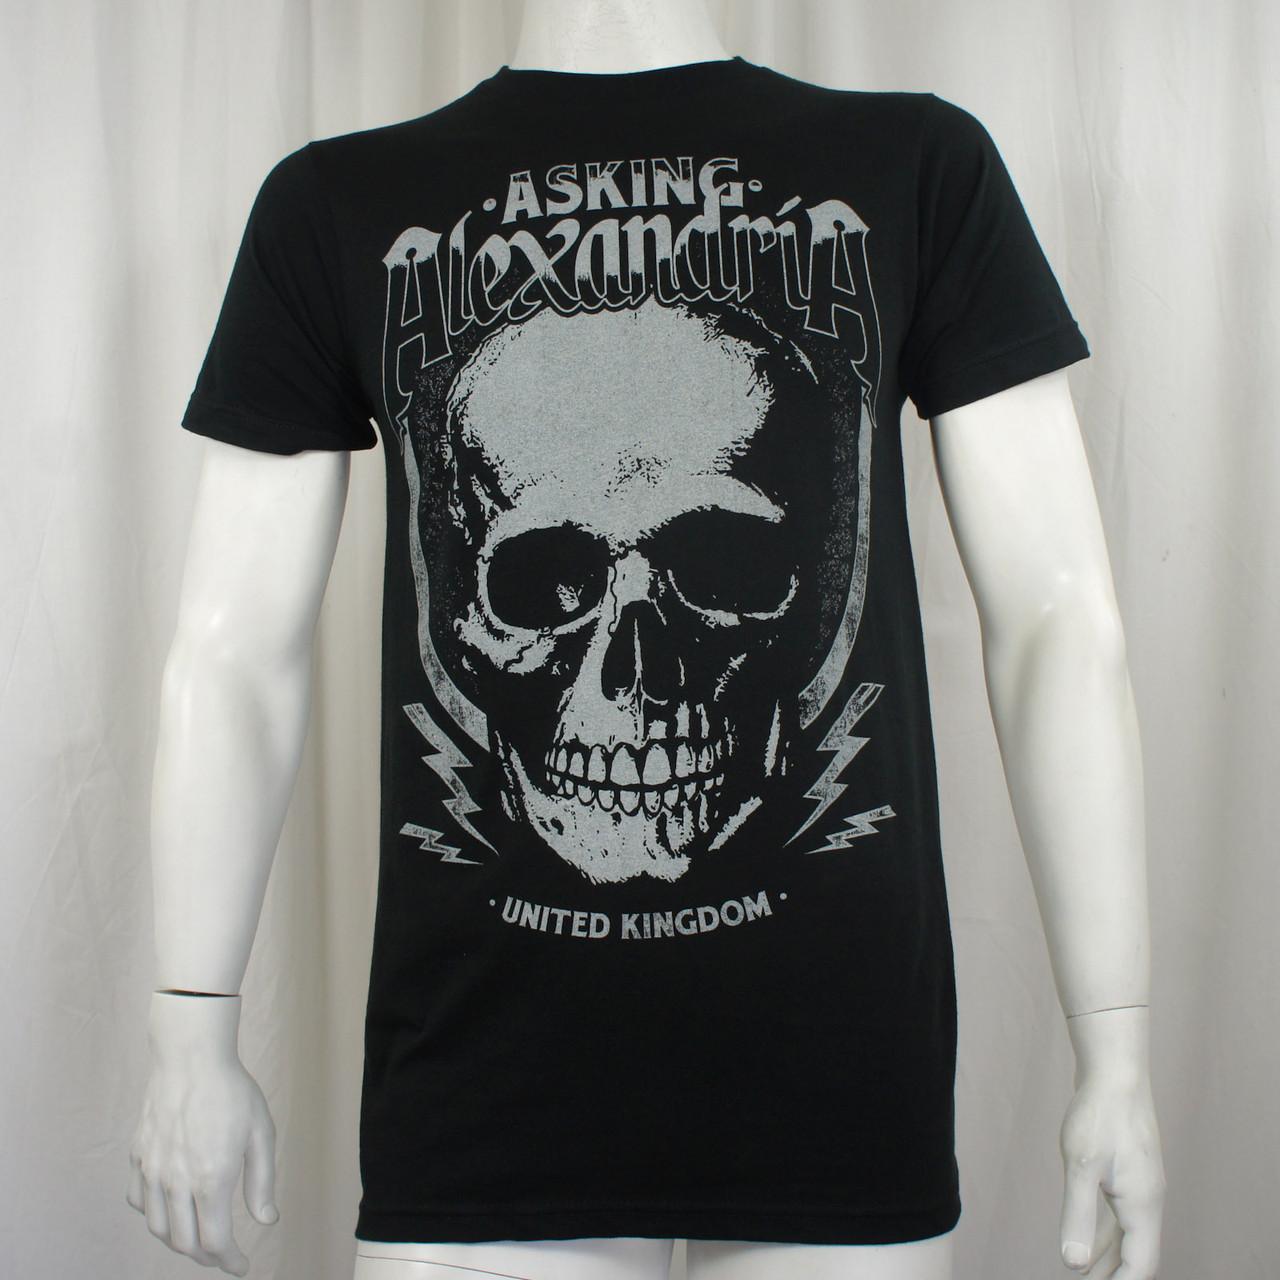 Asking Alexandria T-Shirt Skull Jack